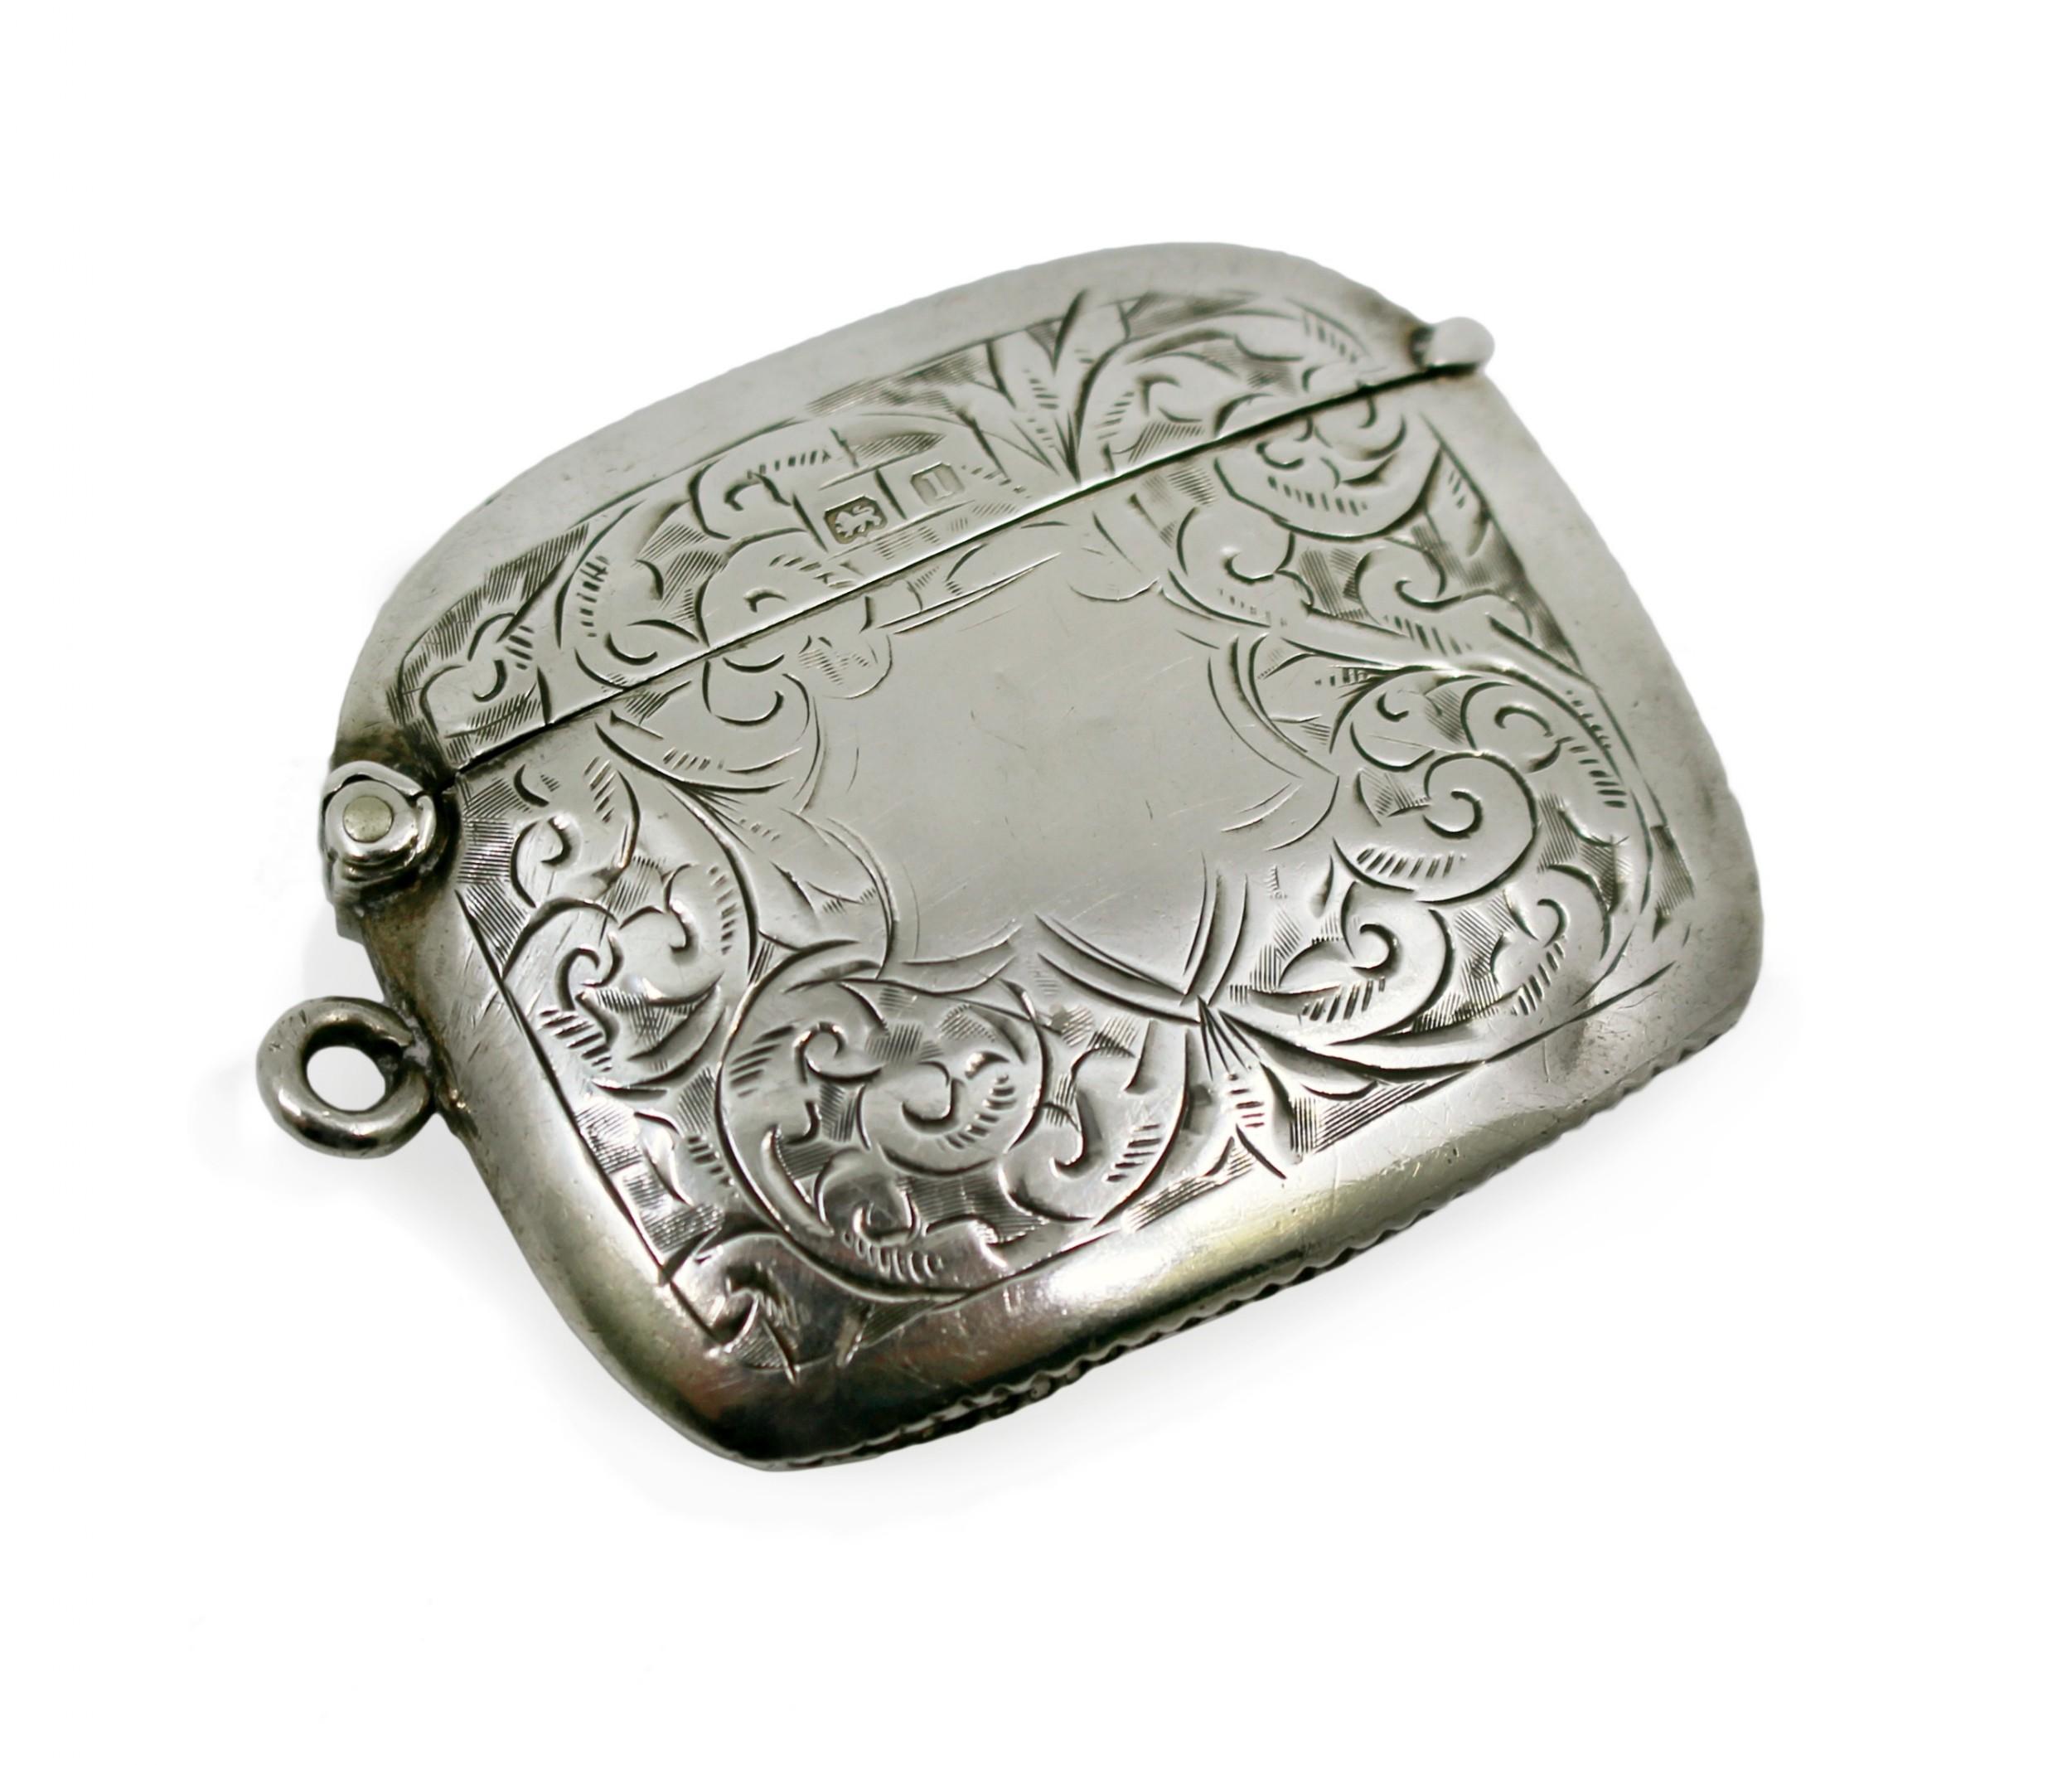 edwardian solid silver engraved match case birmingham 1910